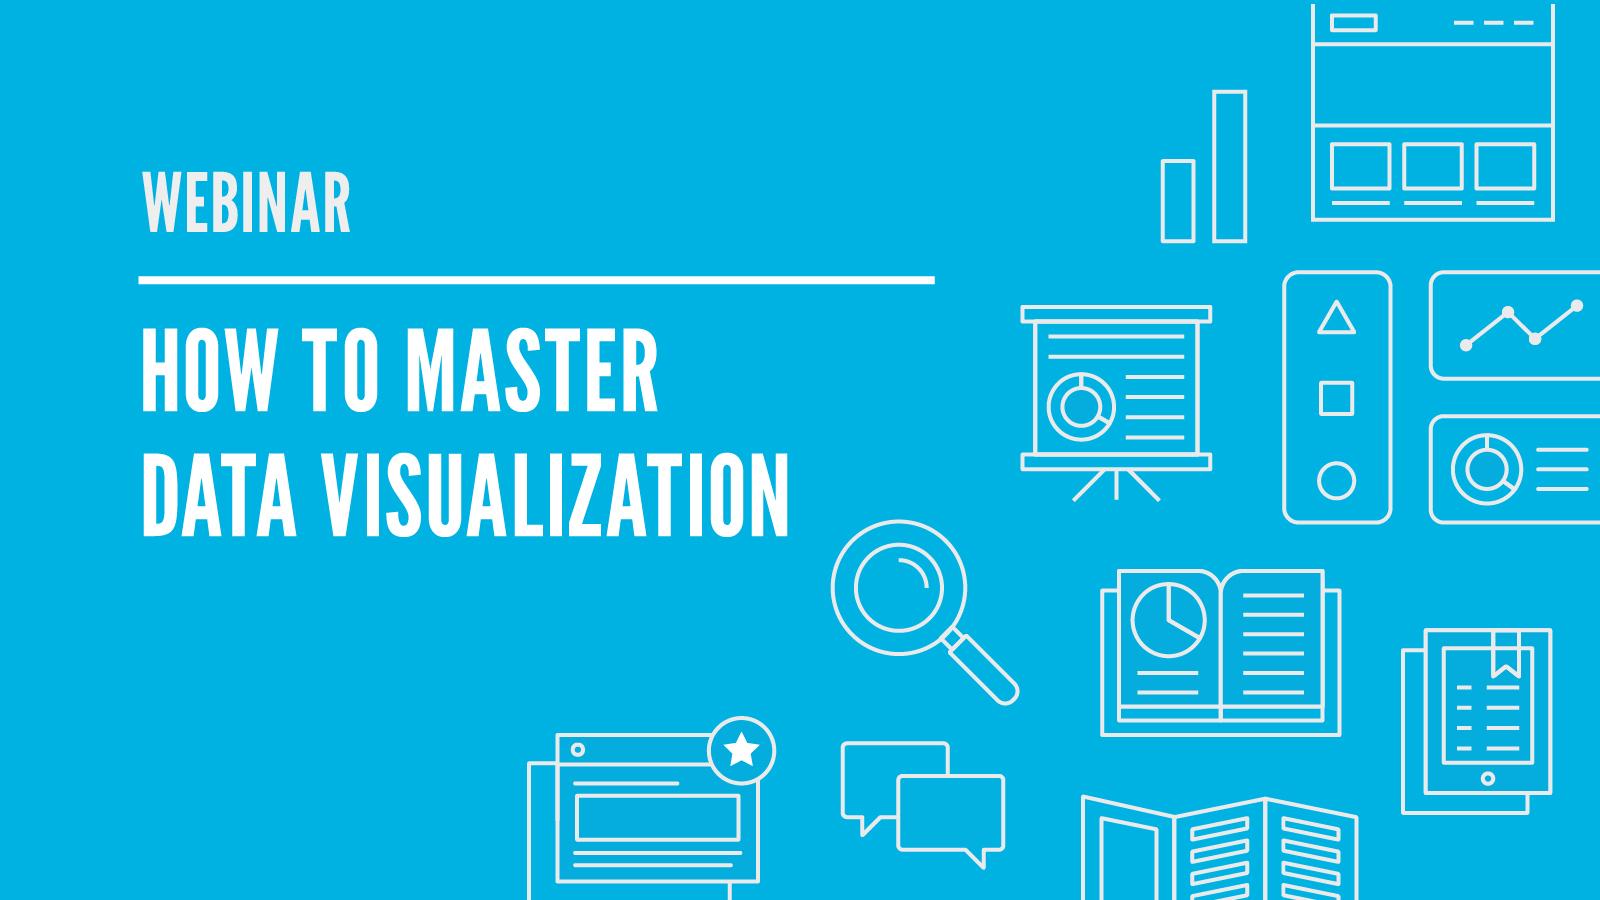 How to Master Data Visualization Webinar